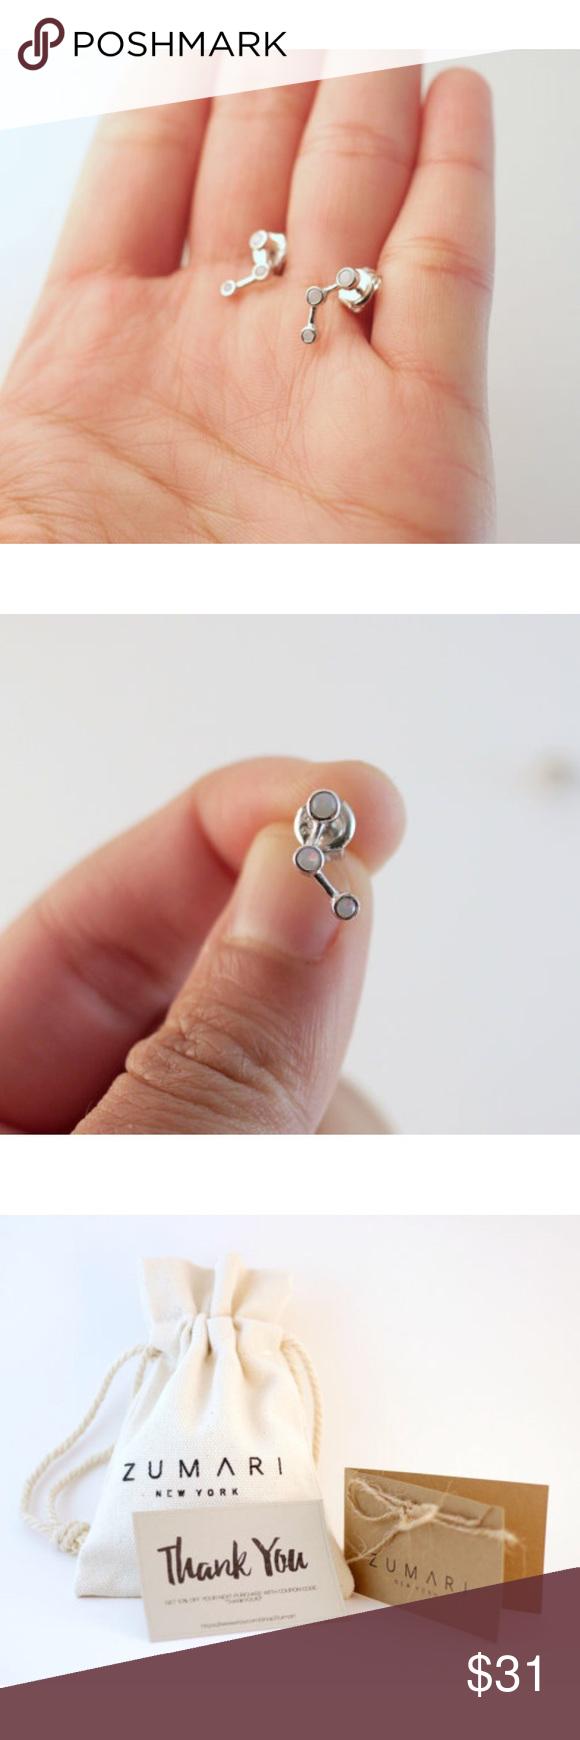 Selling this Opal Earring Climbers   Sterling Silver on Poshmark! My username is: zumari. #shopmycloset #poshmark #fashion #shopping #style #forsale #ZUMARI #Jewelry